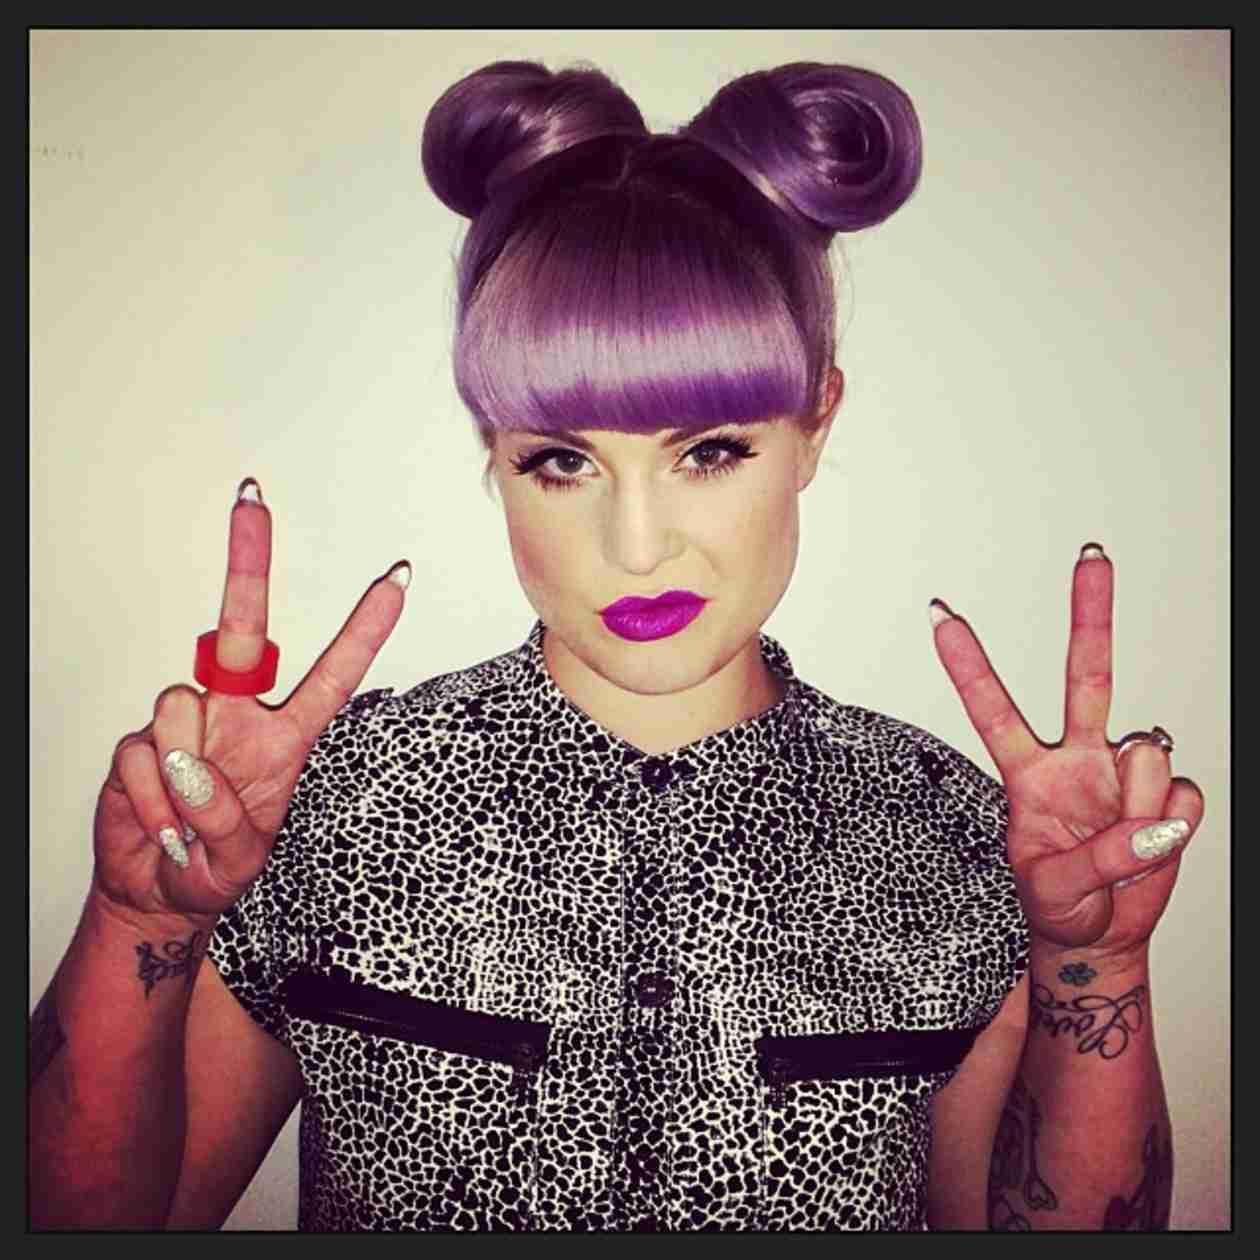 Kelly Osbourne Blasts Paris Hilton on Twitter After Coachella Encounter (VIDEO)